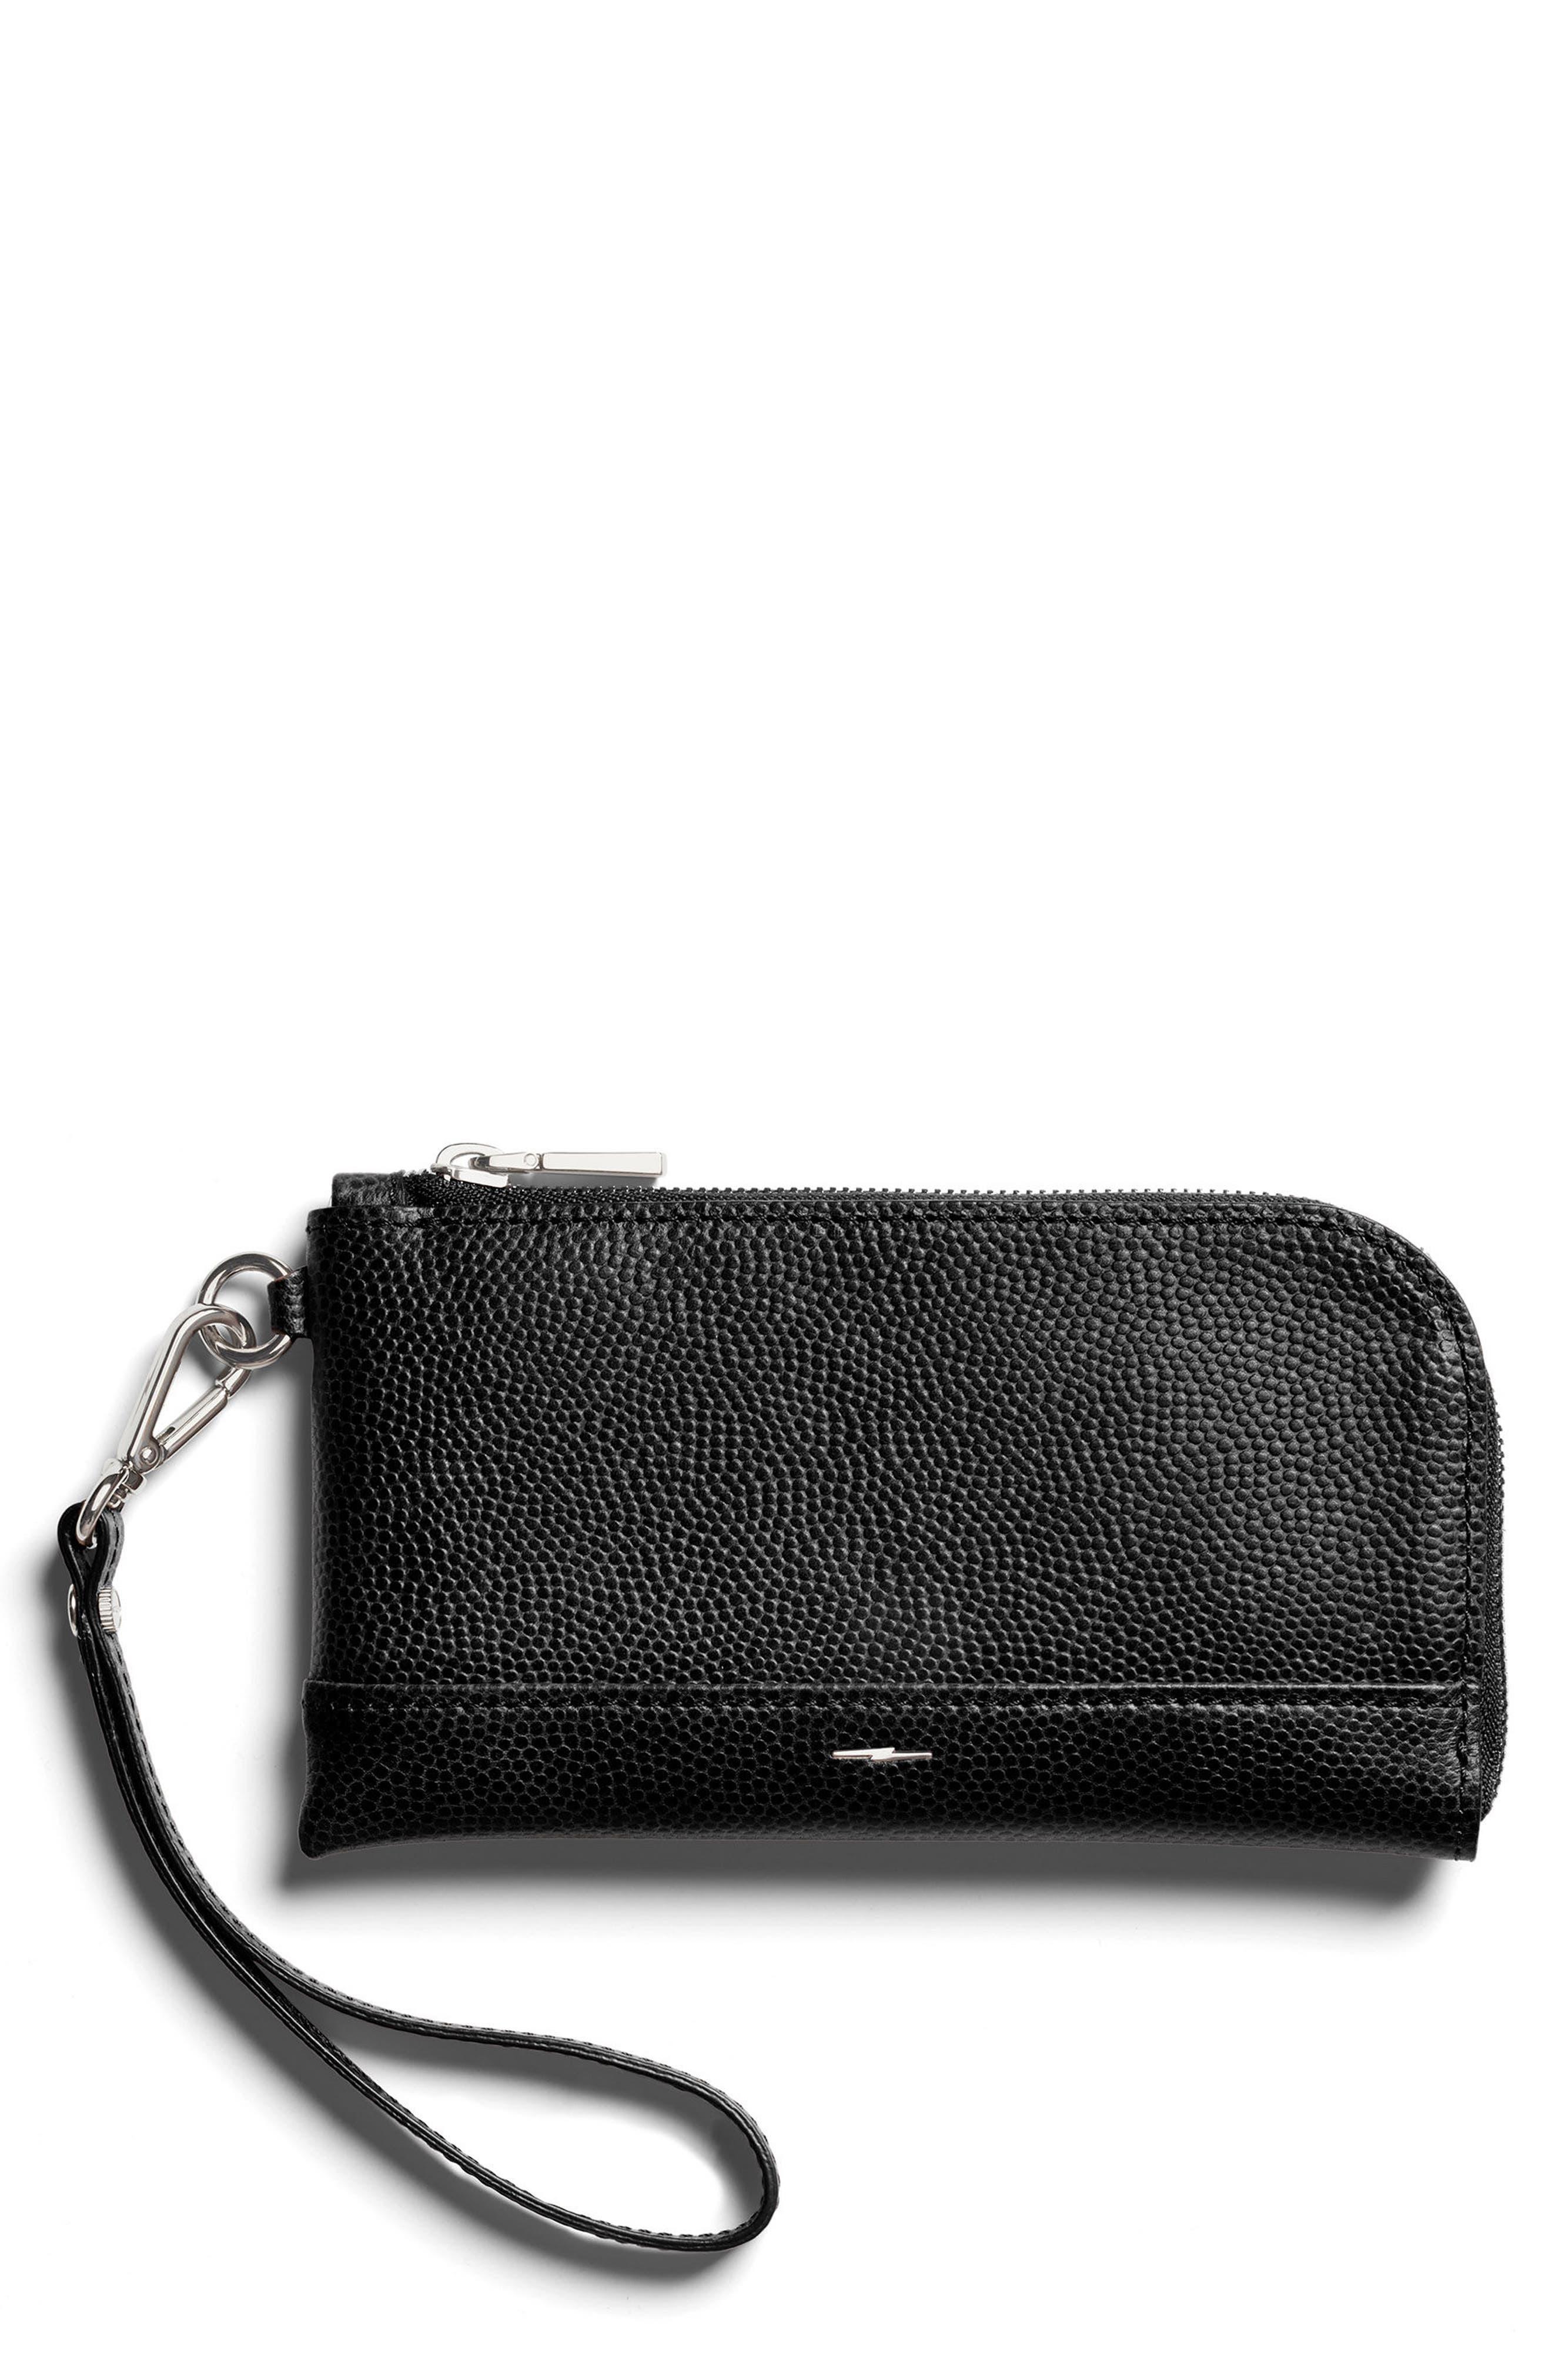 Latigo Leather Wristlet,                             Main thumbnail 1, color,                             001